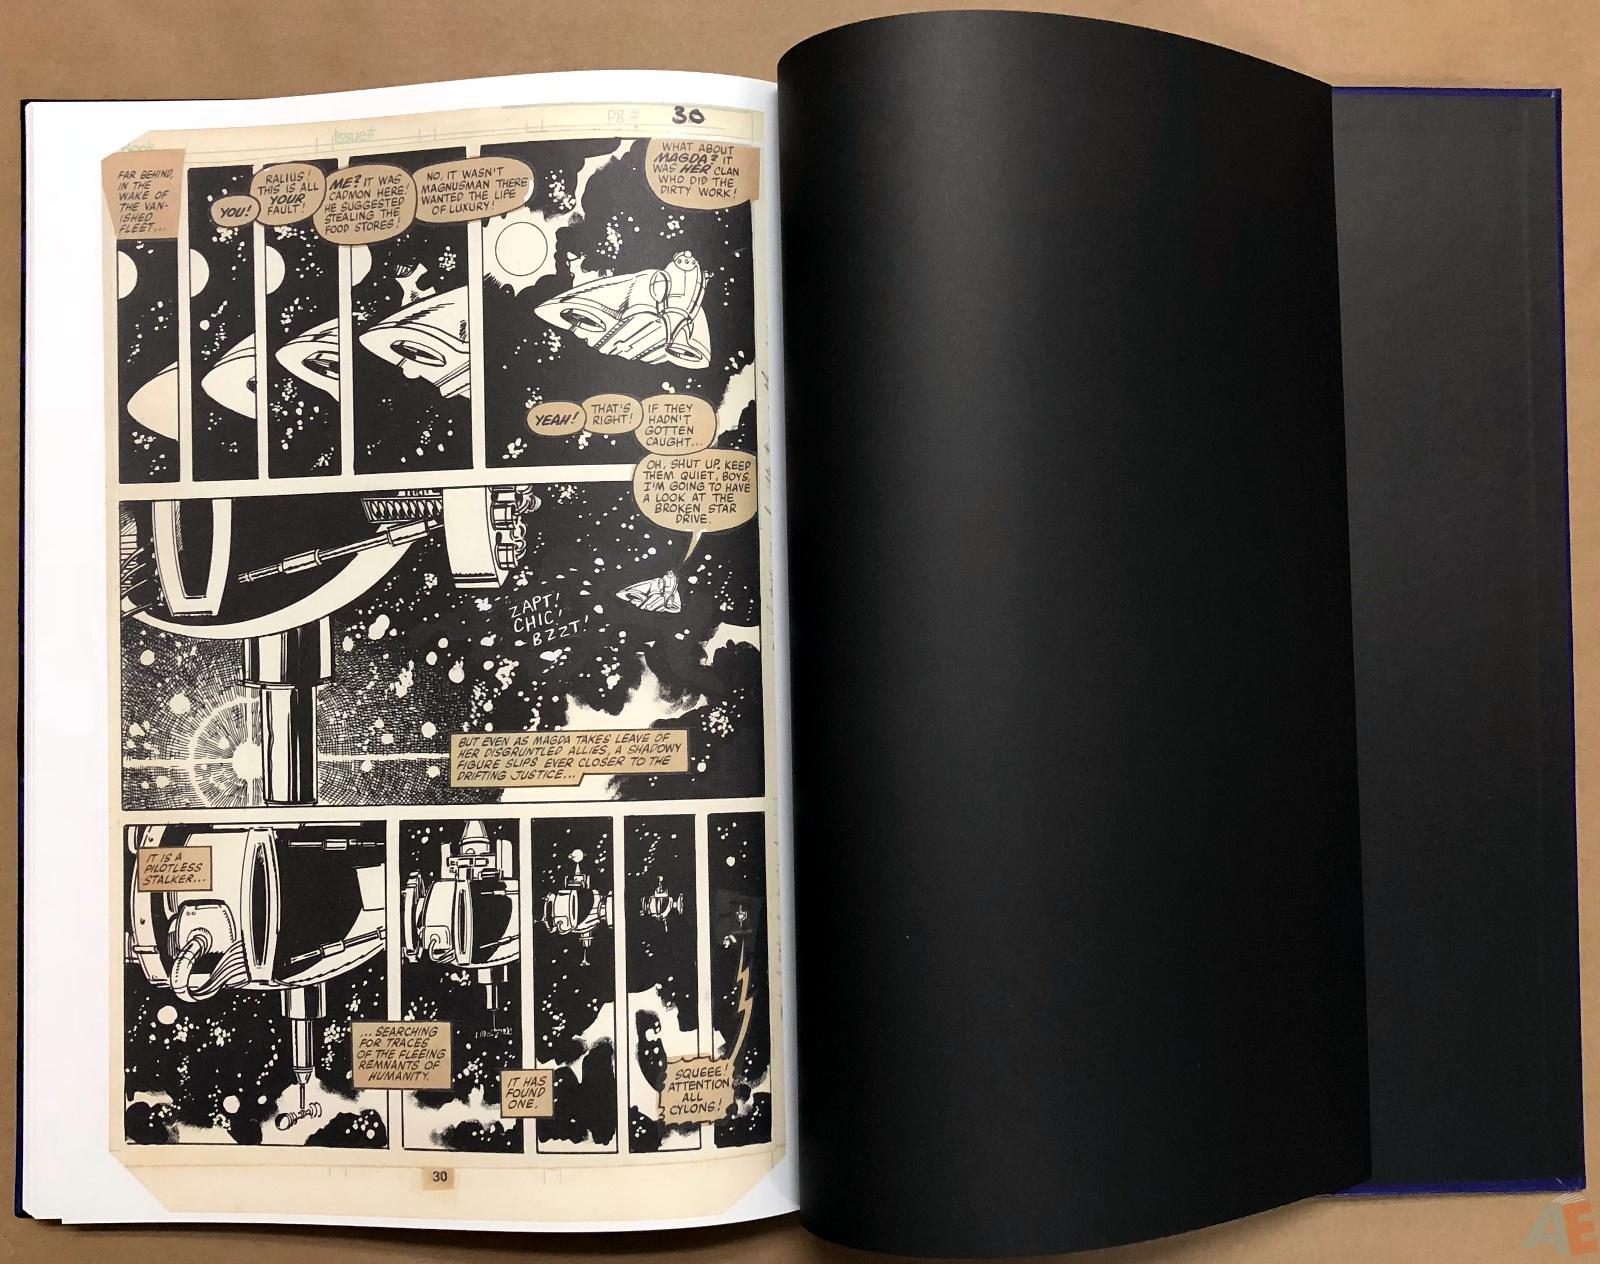 Walter Simonson's Battlestar Galactica Art Edition 34